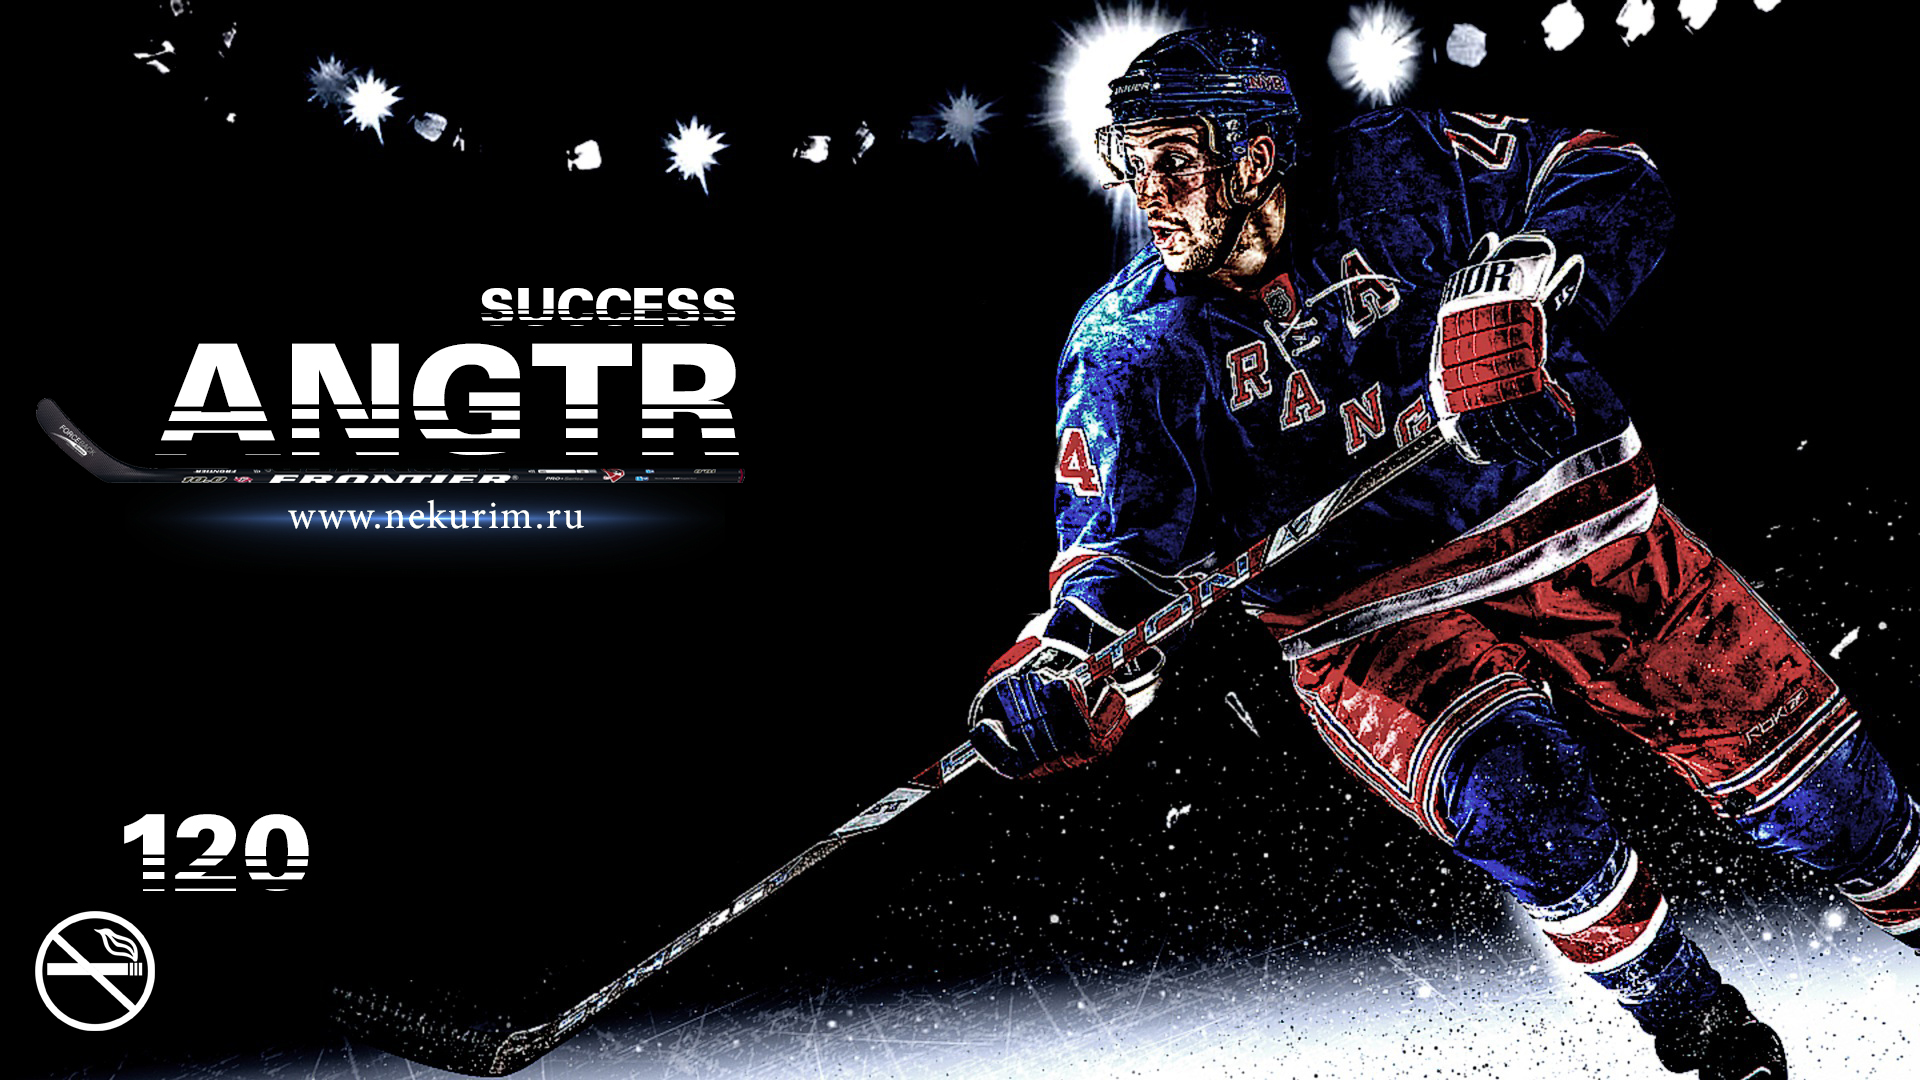 sport___hockey_best-angtr-120-jpg.281940